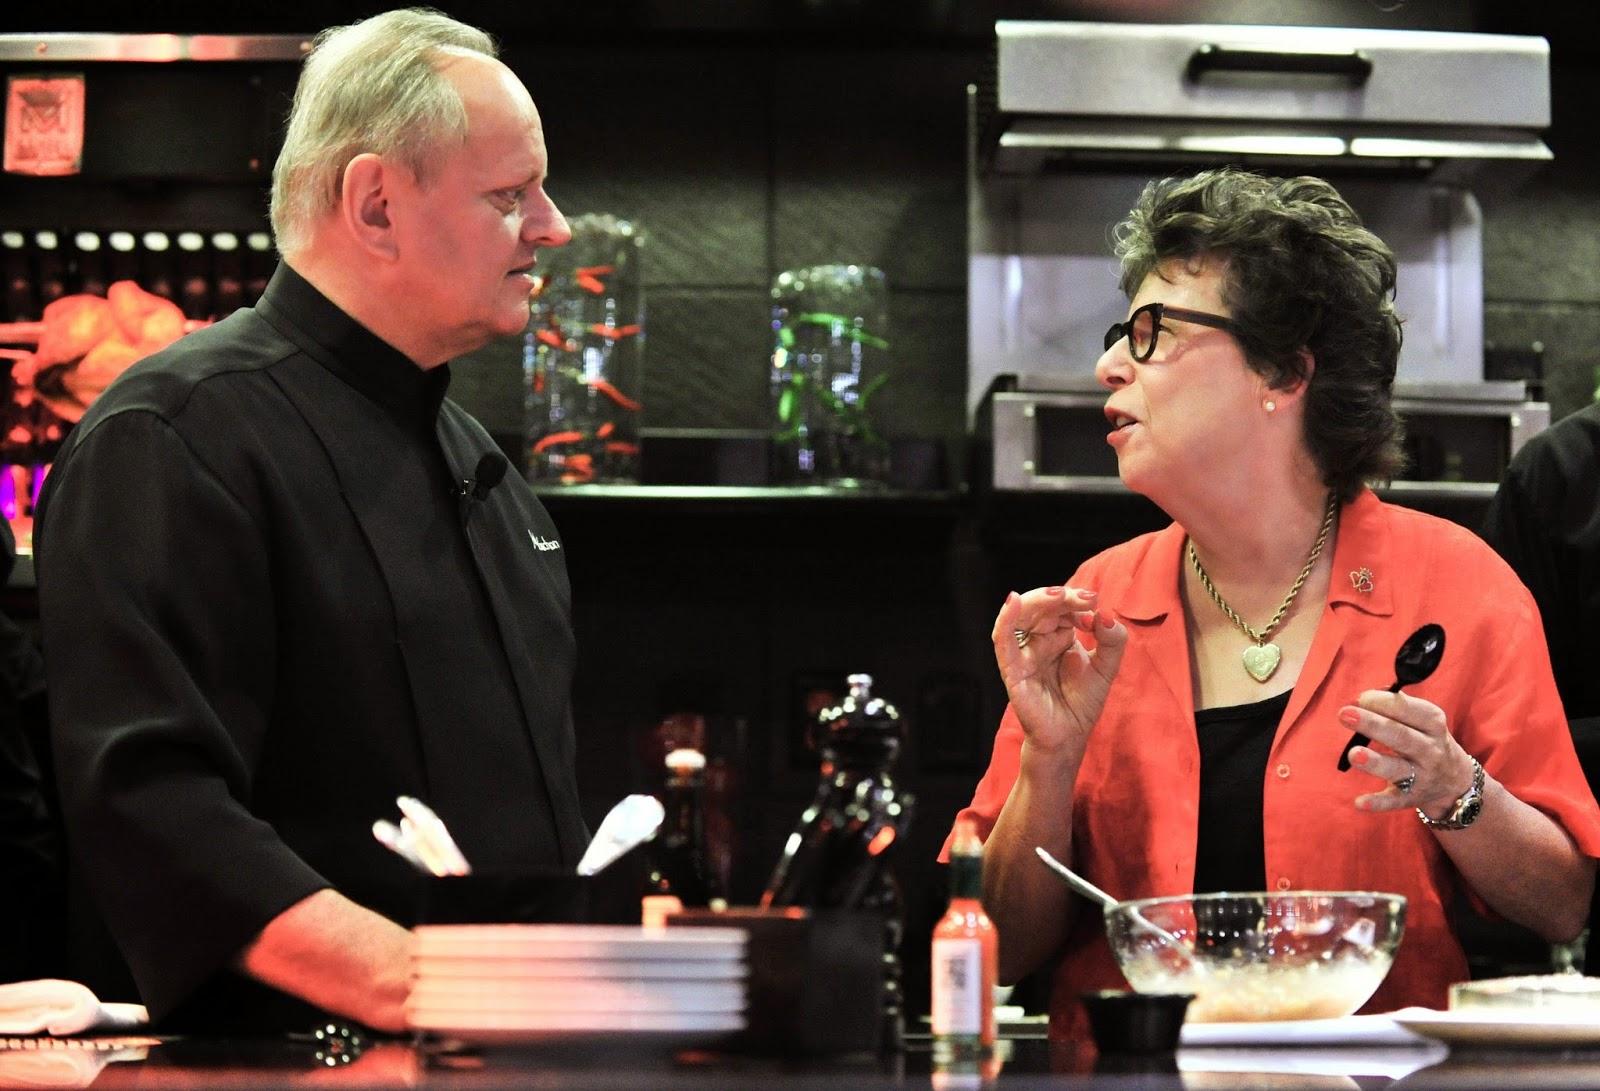 2014 Vegas UnCork'd Joel Robuchon Cooking demo L'Atelier de Joel Robuchon